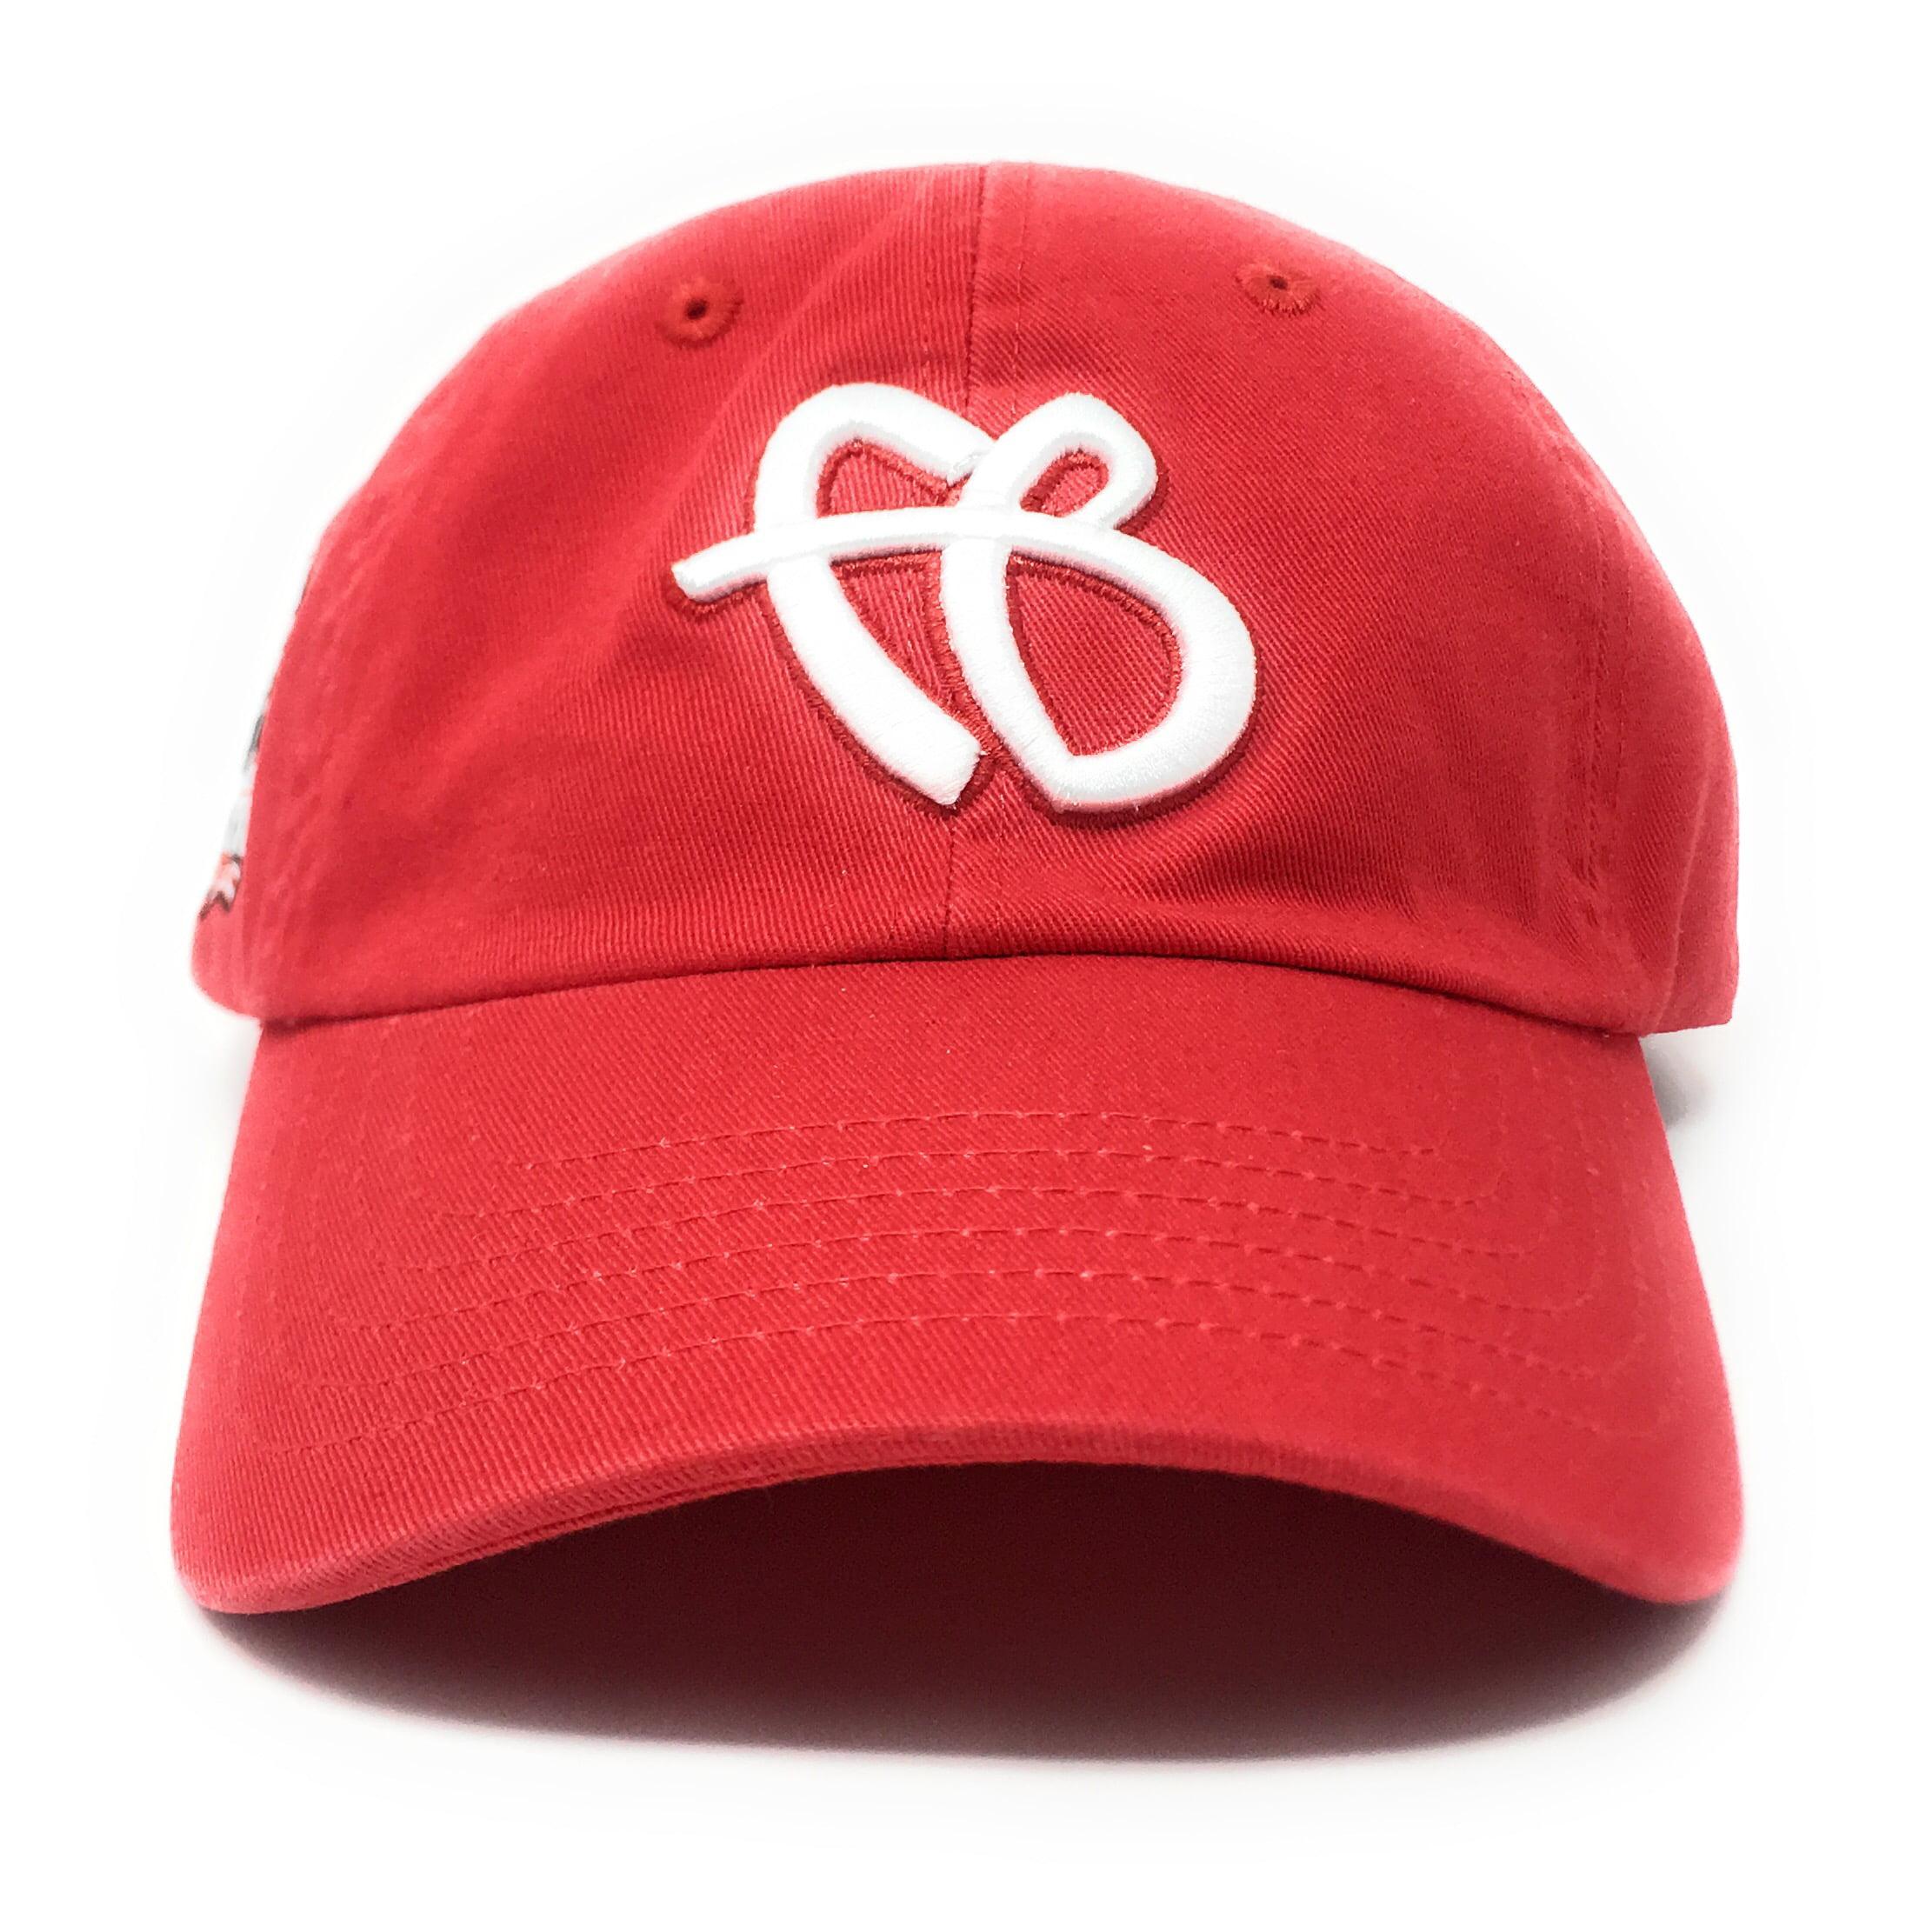 "25 30 Anniversary Cap: FUBU ""FB"" Logo 25th Anniversary Dad Red Snapback Hat"